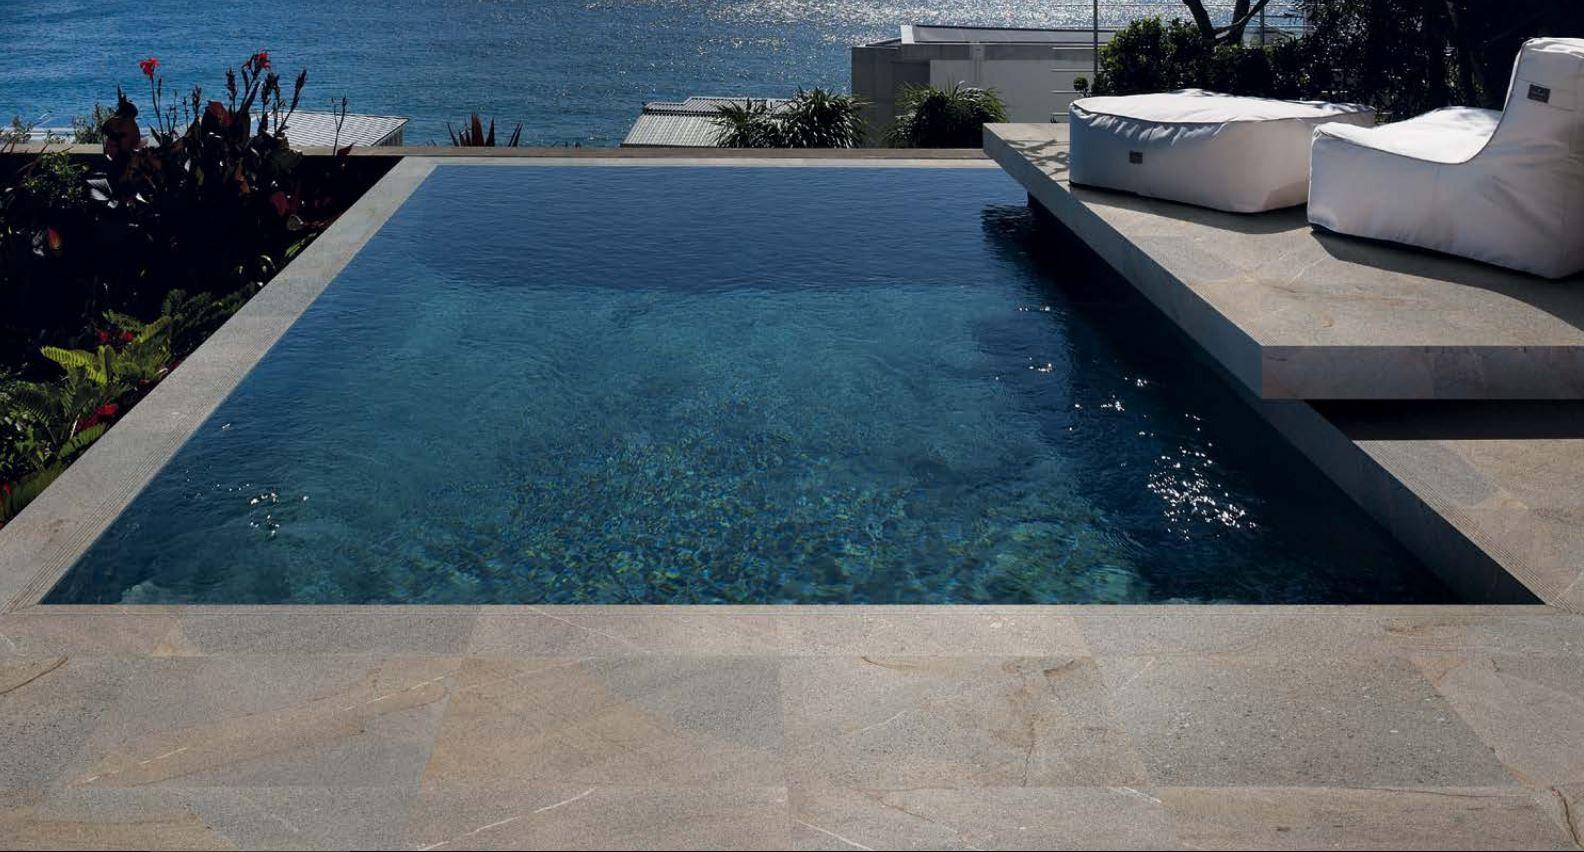 Ergon cornerstone granite stone 20mm 60x60 cm x604f7 for Pool in steinoptik